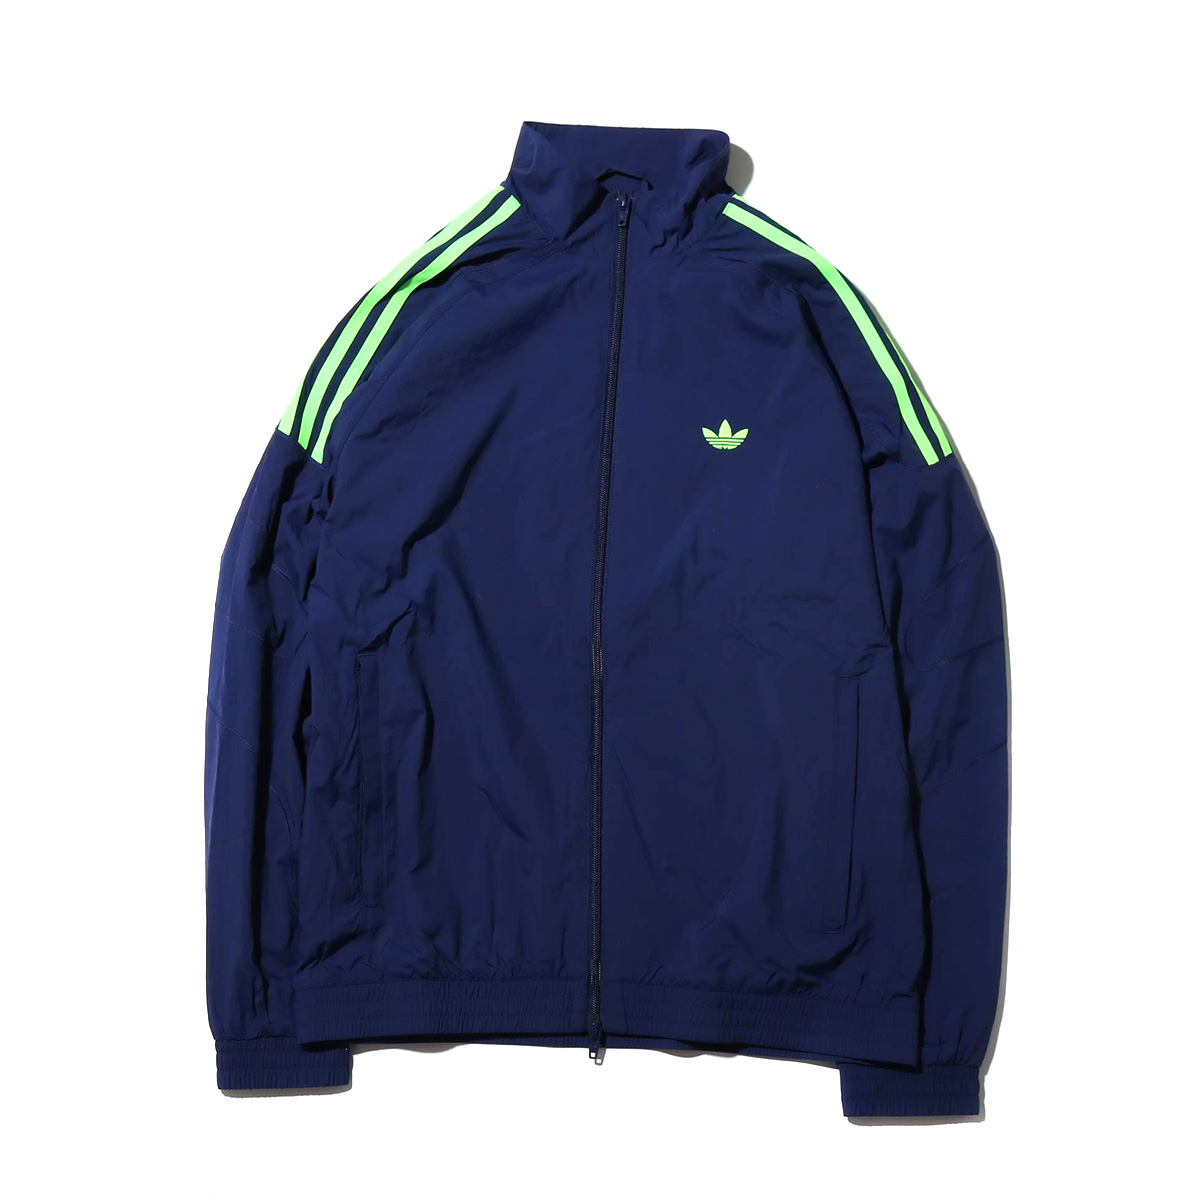 adidas Originals FLAMESTRIKE WOVEN TRACK TOP (DARK BLUE) (the Adidas originals frame strike Woo BUND rack top)